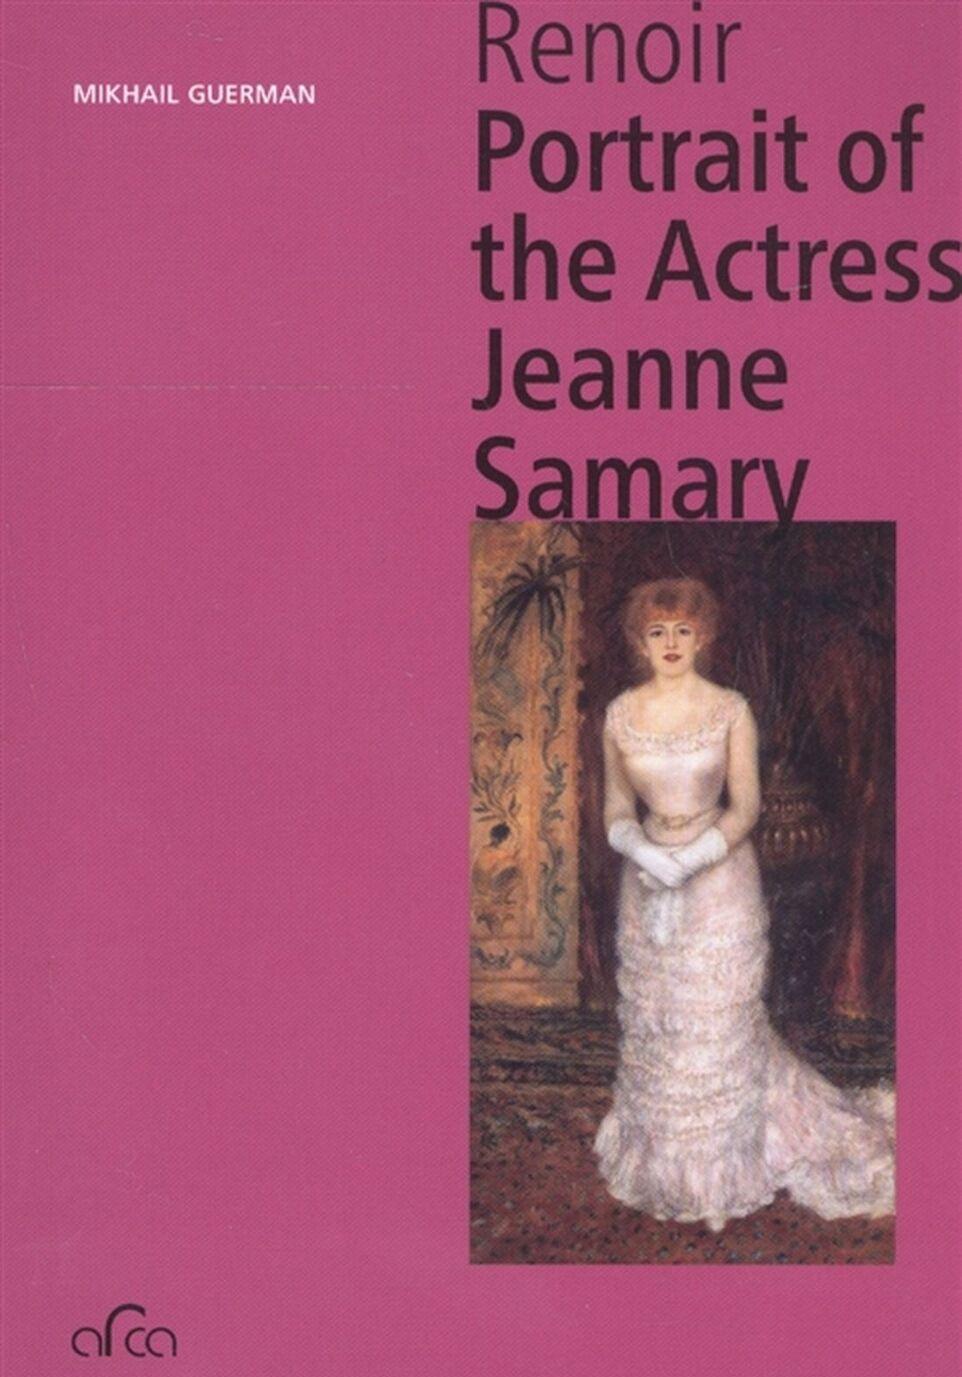 Pierre Auguste Renoir. Portrait of the Actress Jeanne Samary